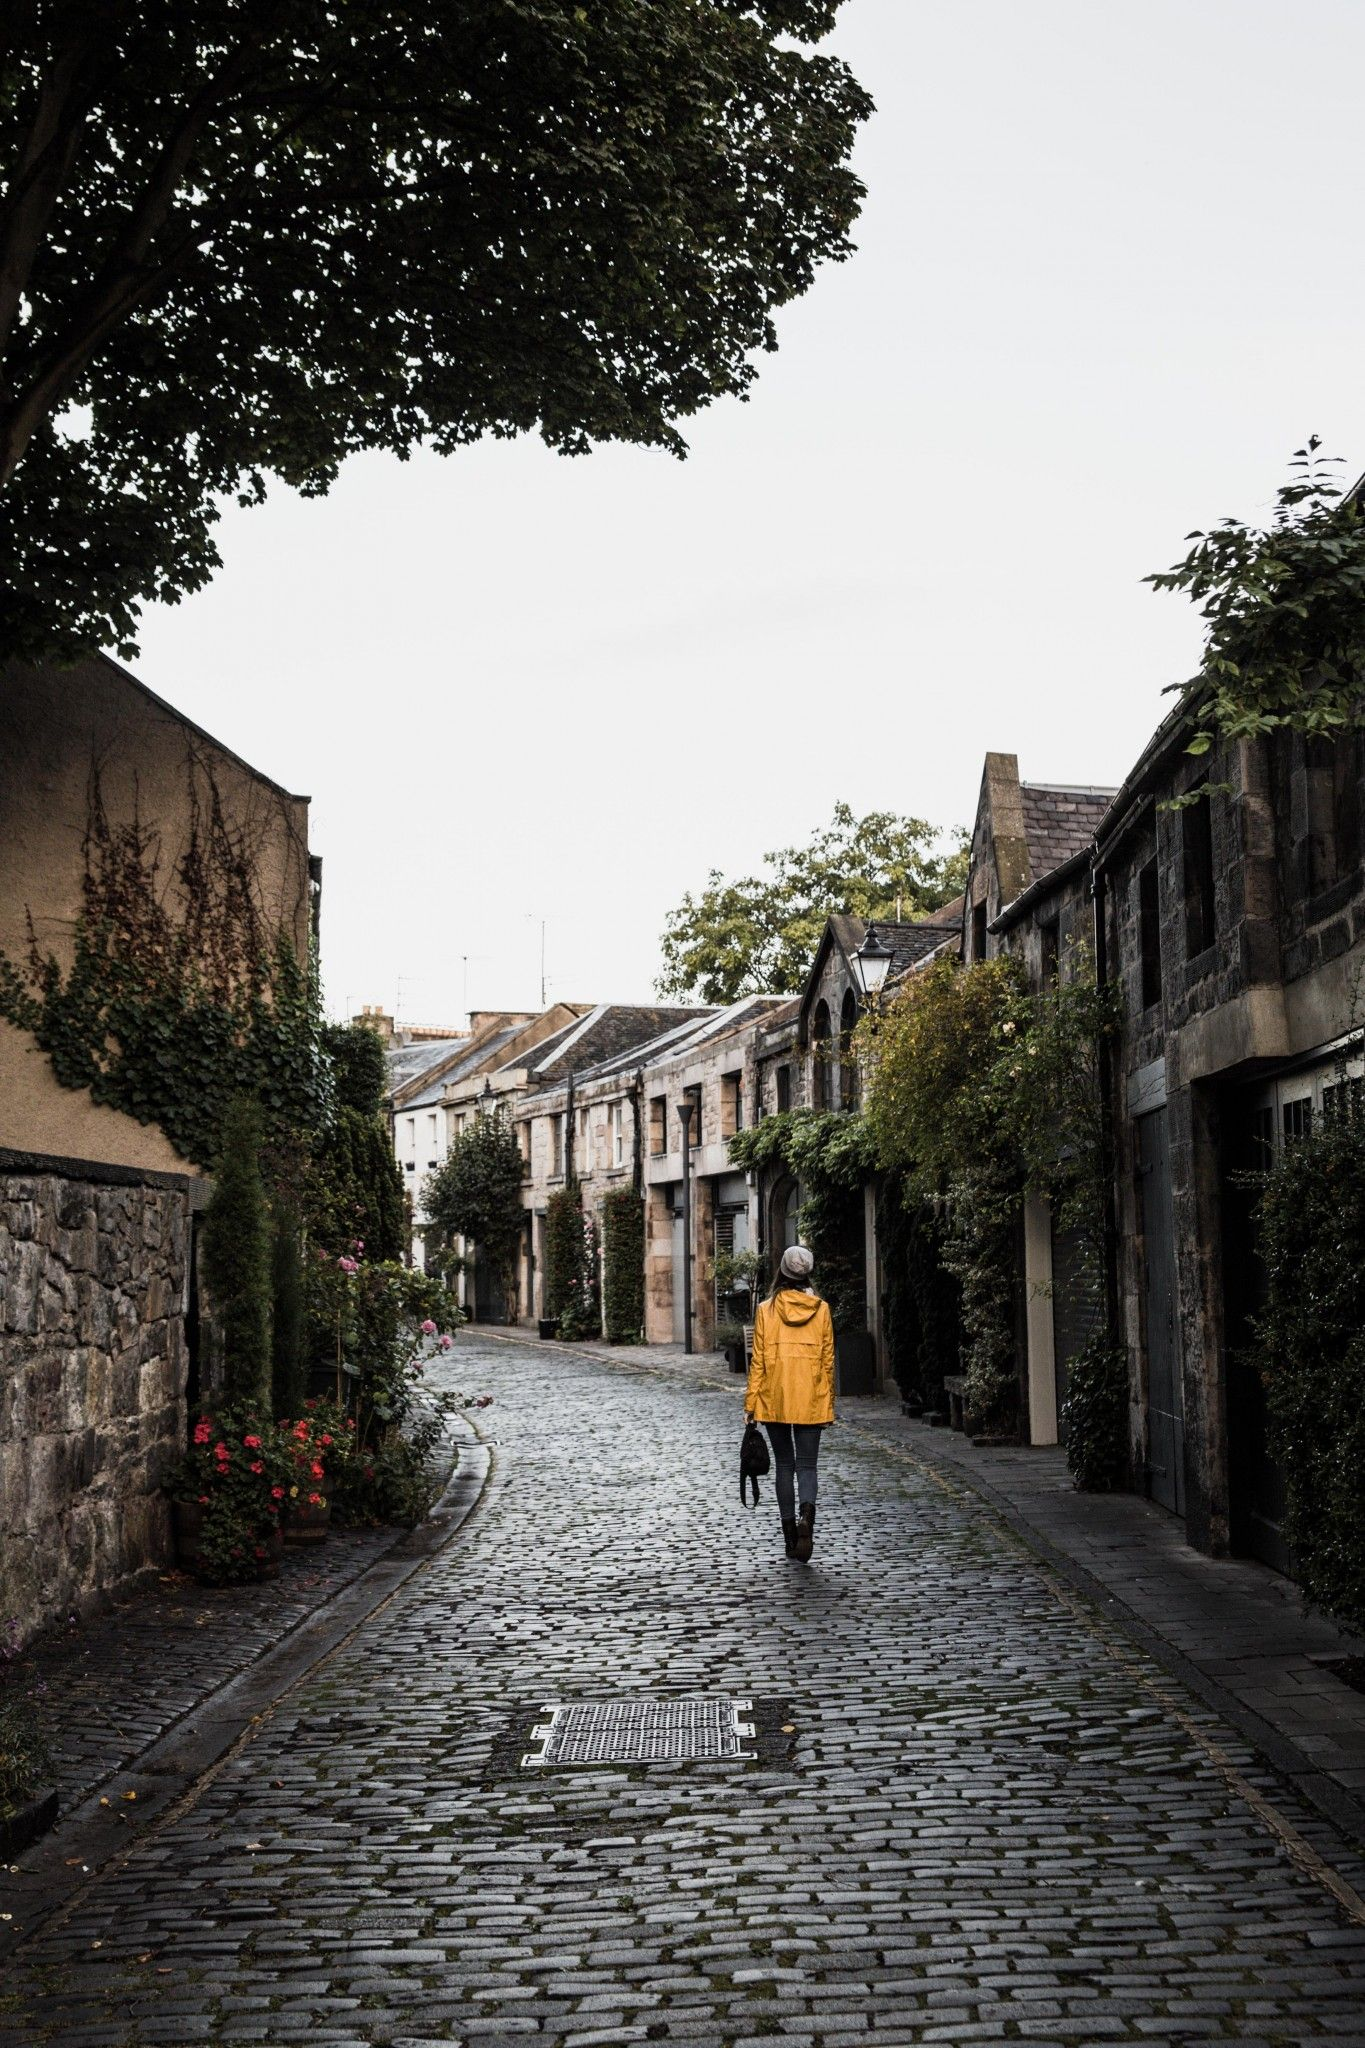 Circus lane edinburgh places to travel edinburgh